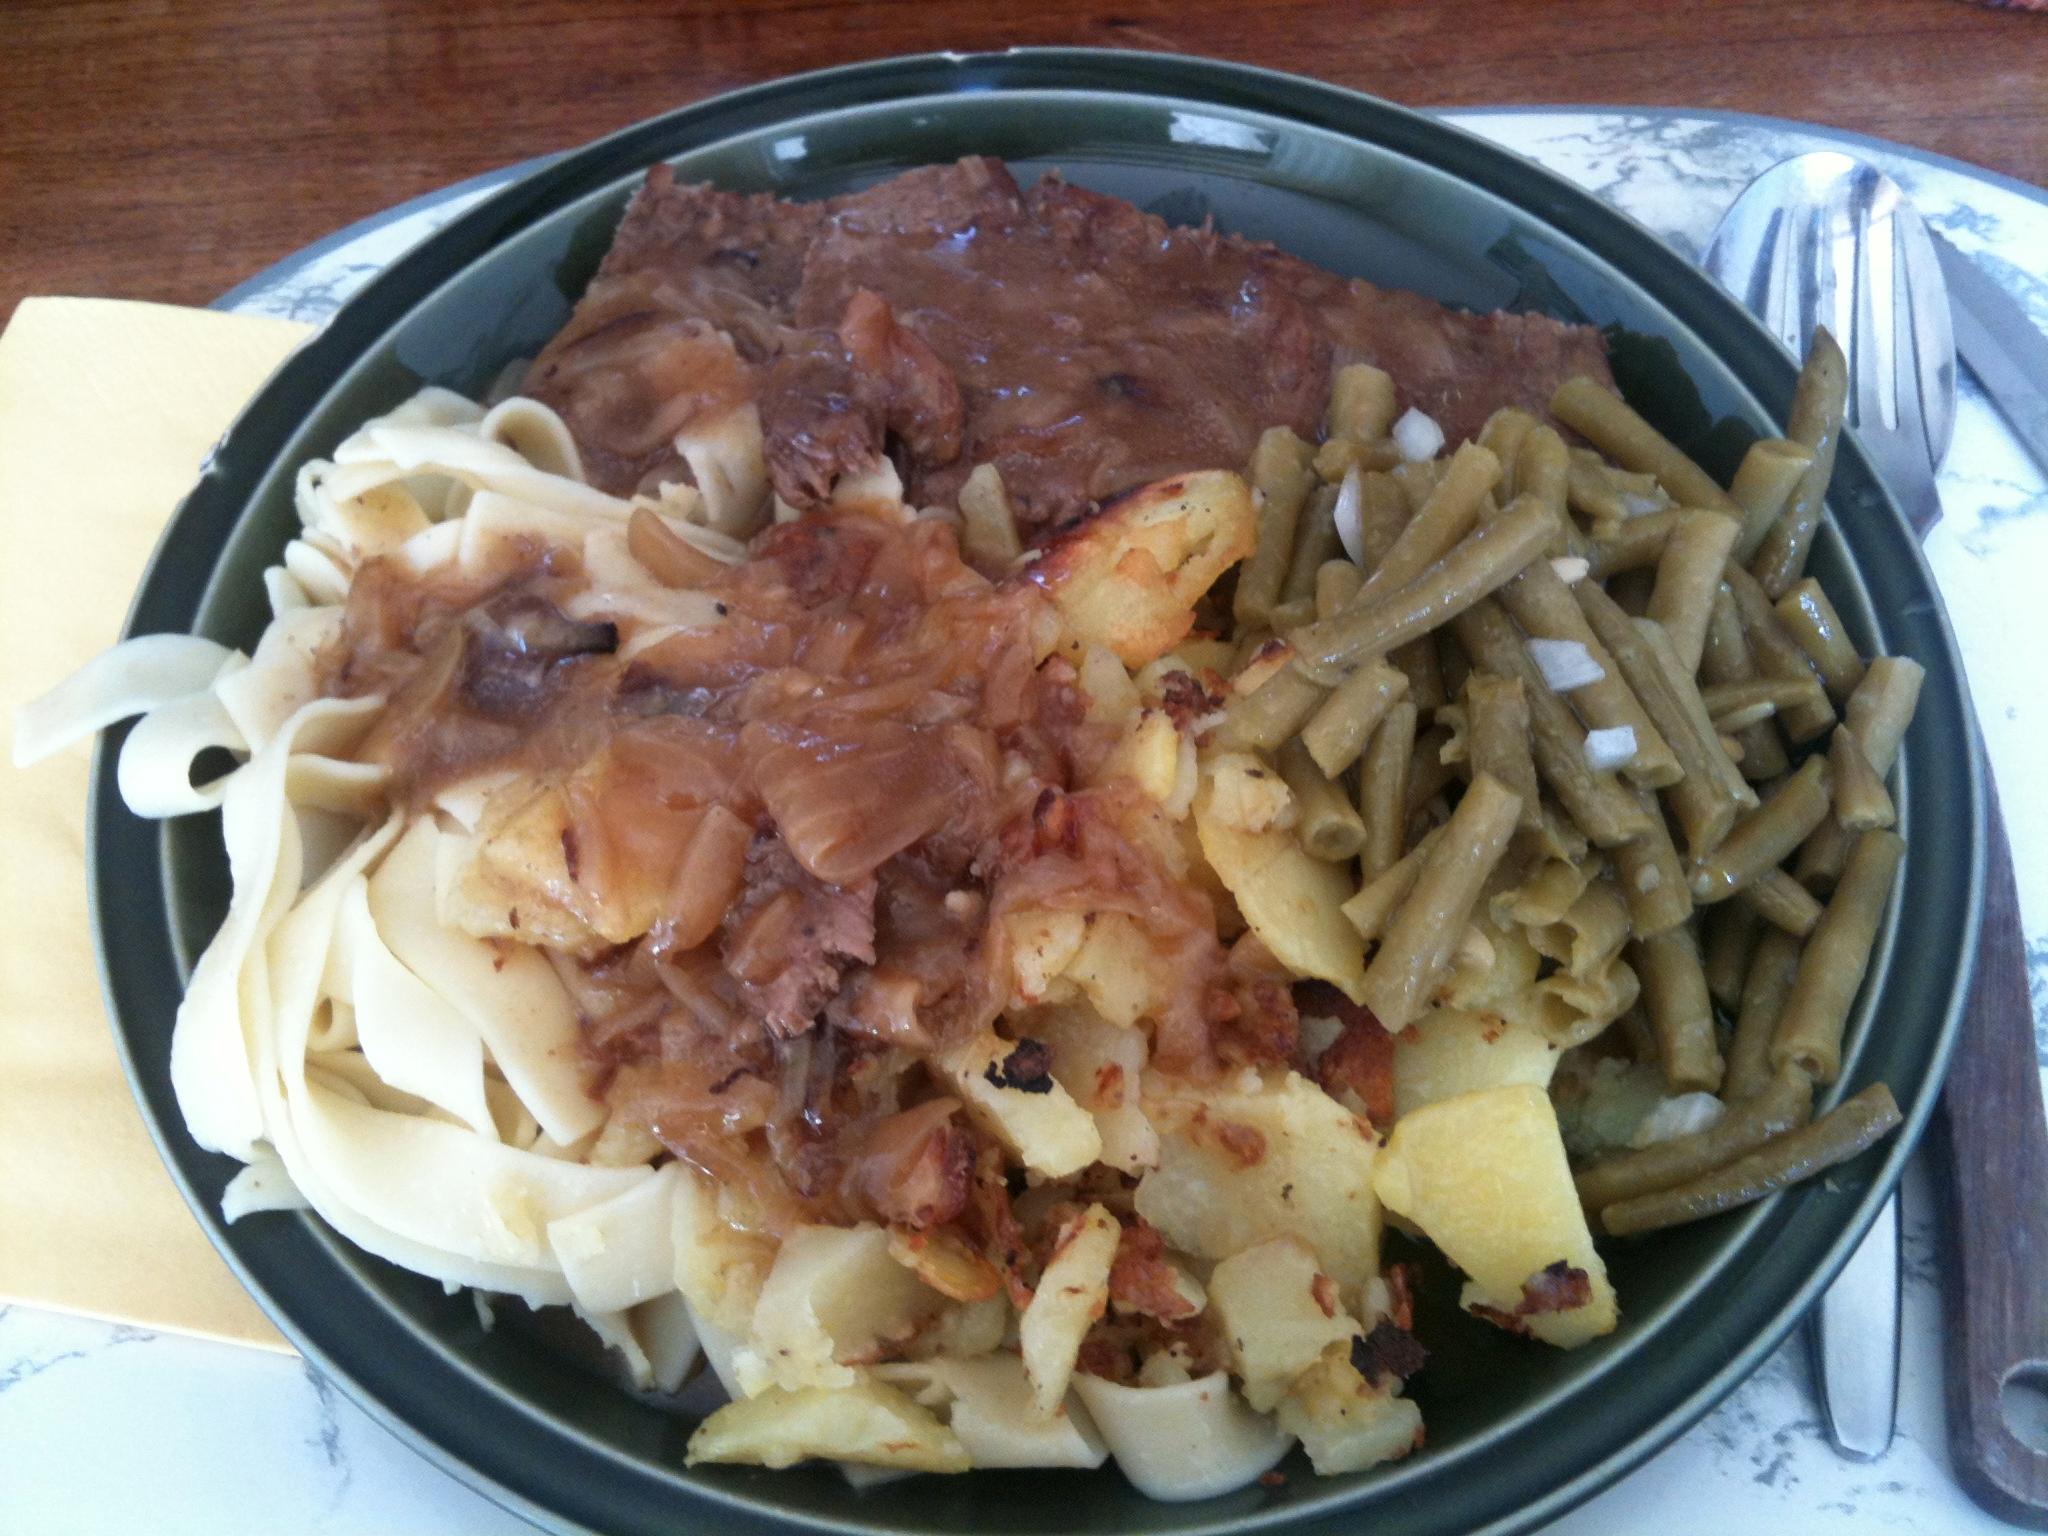 https://foodloader.net/nico_2012-09-14_rostbraten-bratkartoffeln-nudeln-bohnensalat.jpg